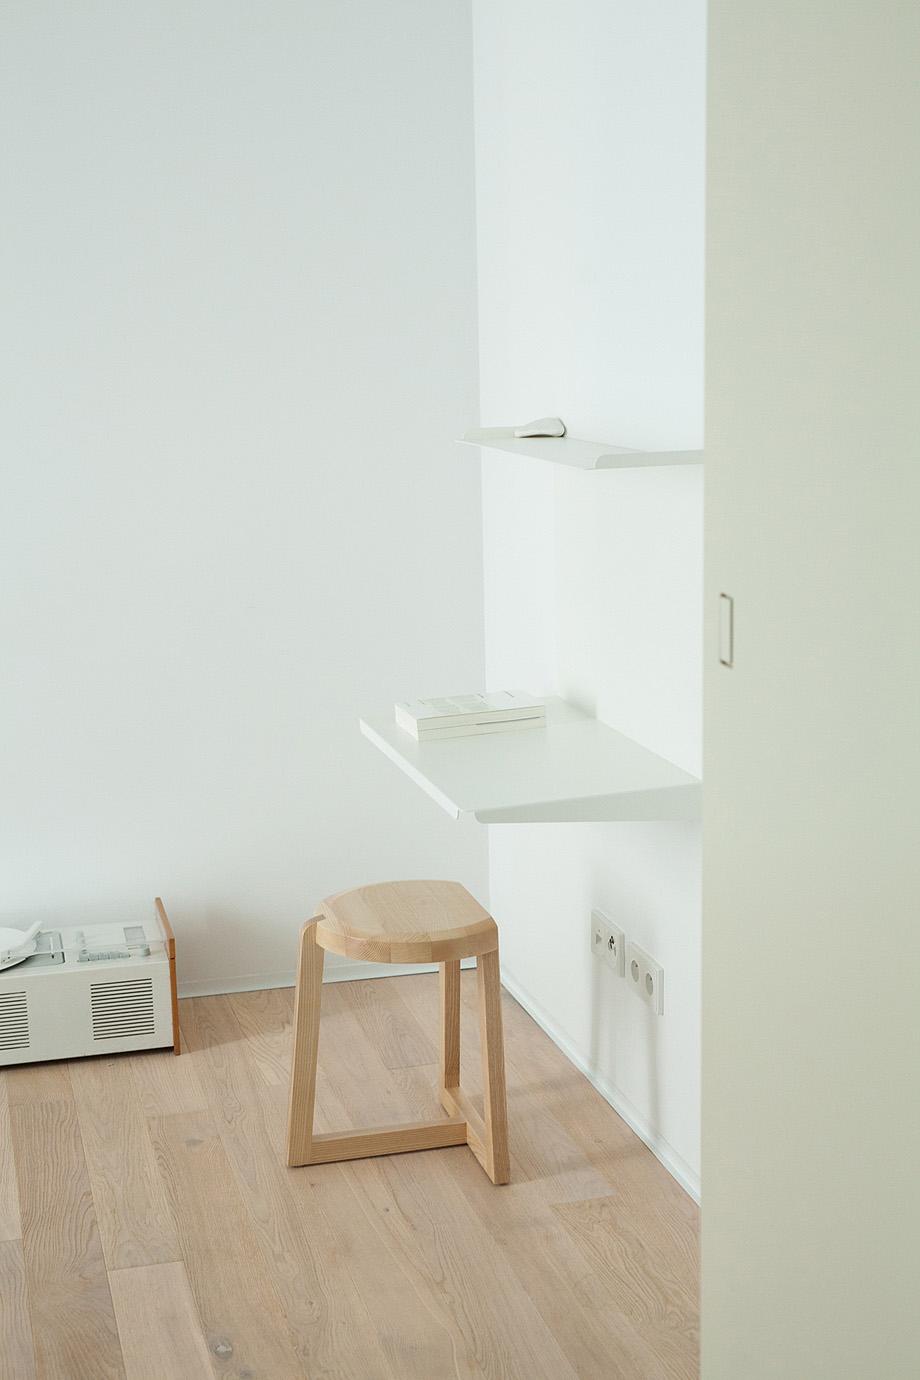 apartamento de alquiler en varsovia por thisispaper studio (13)